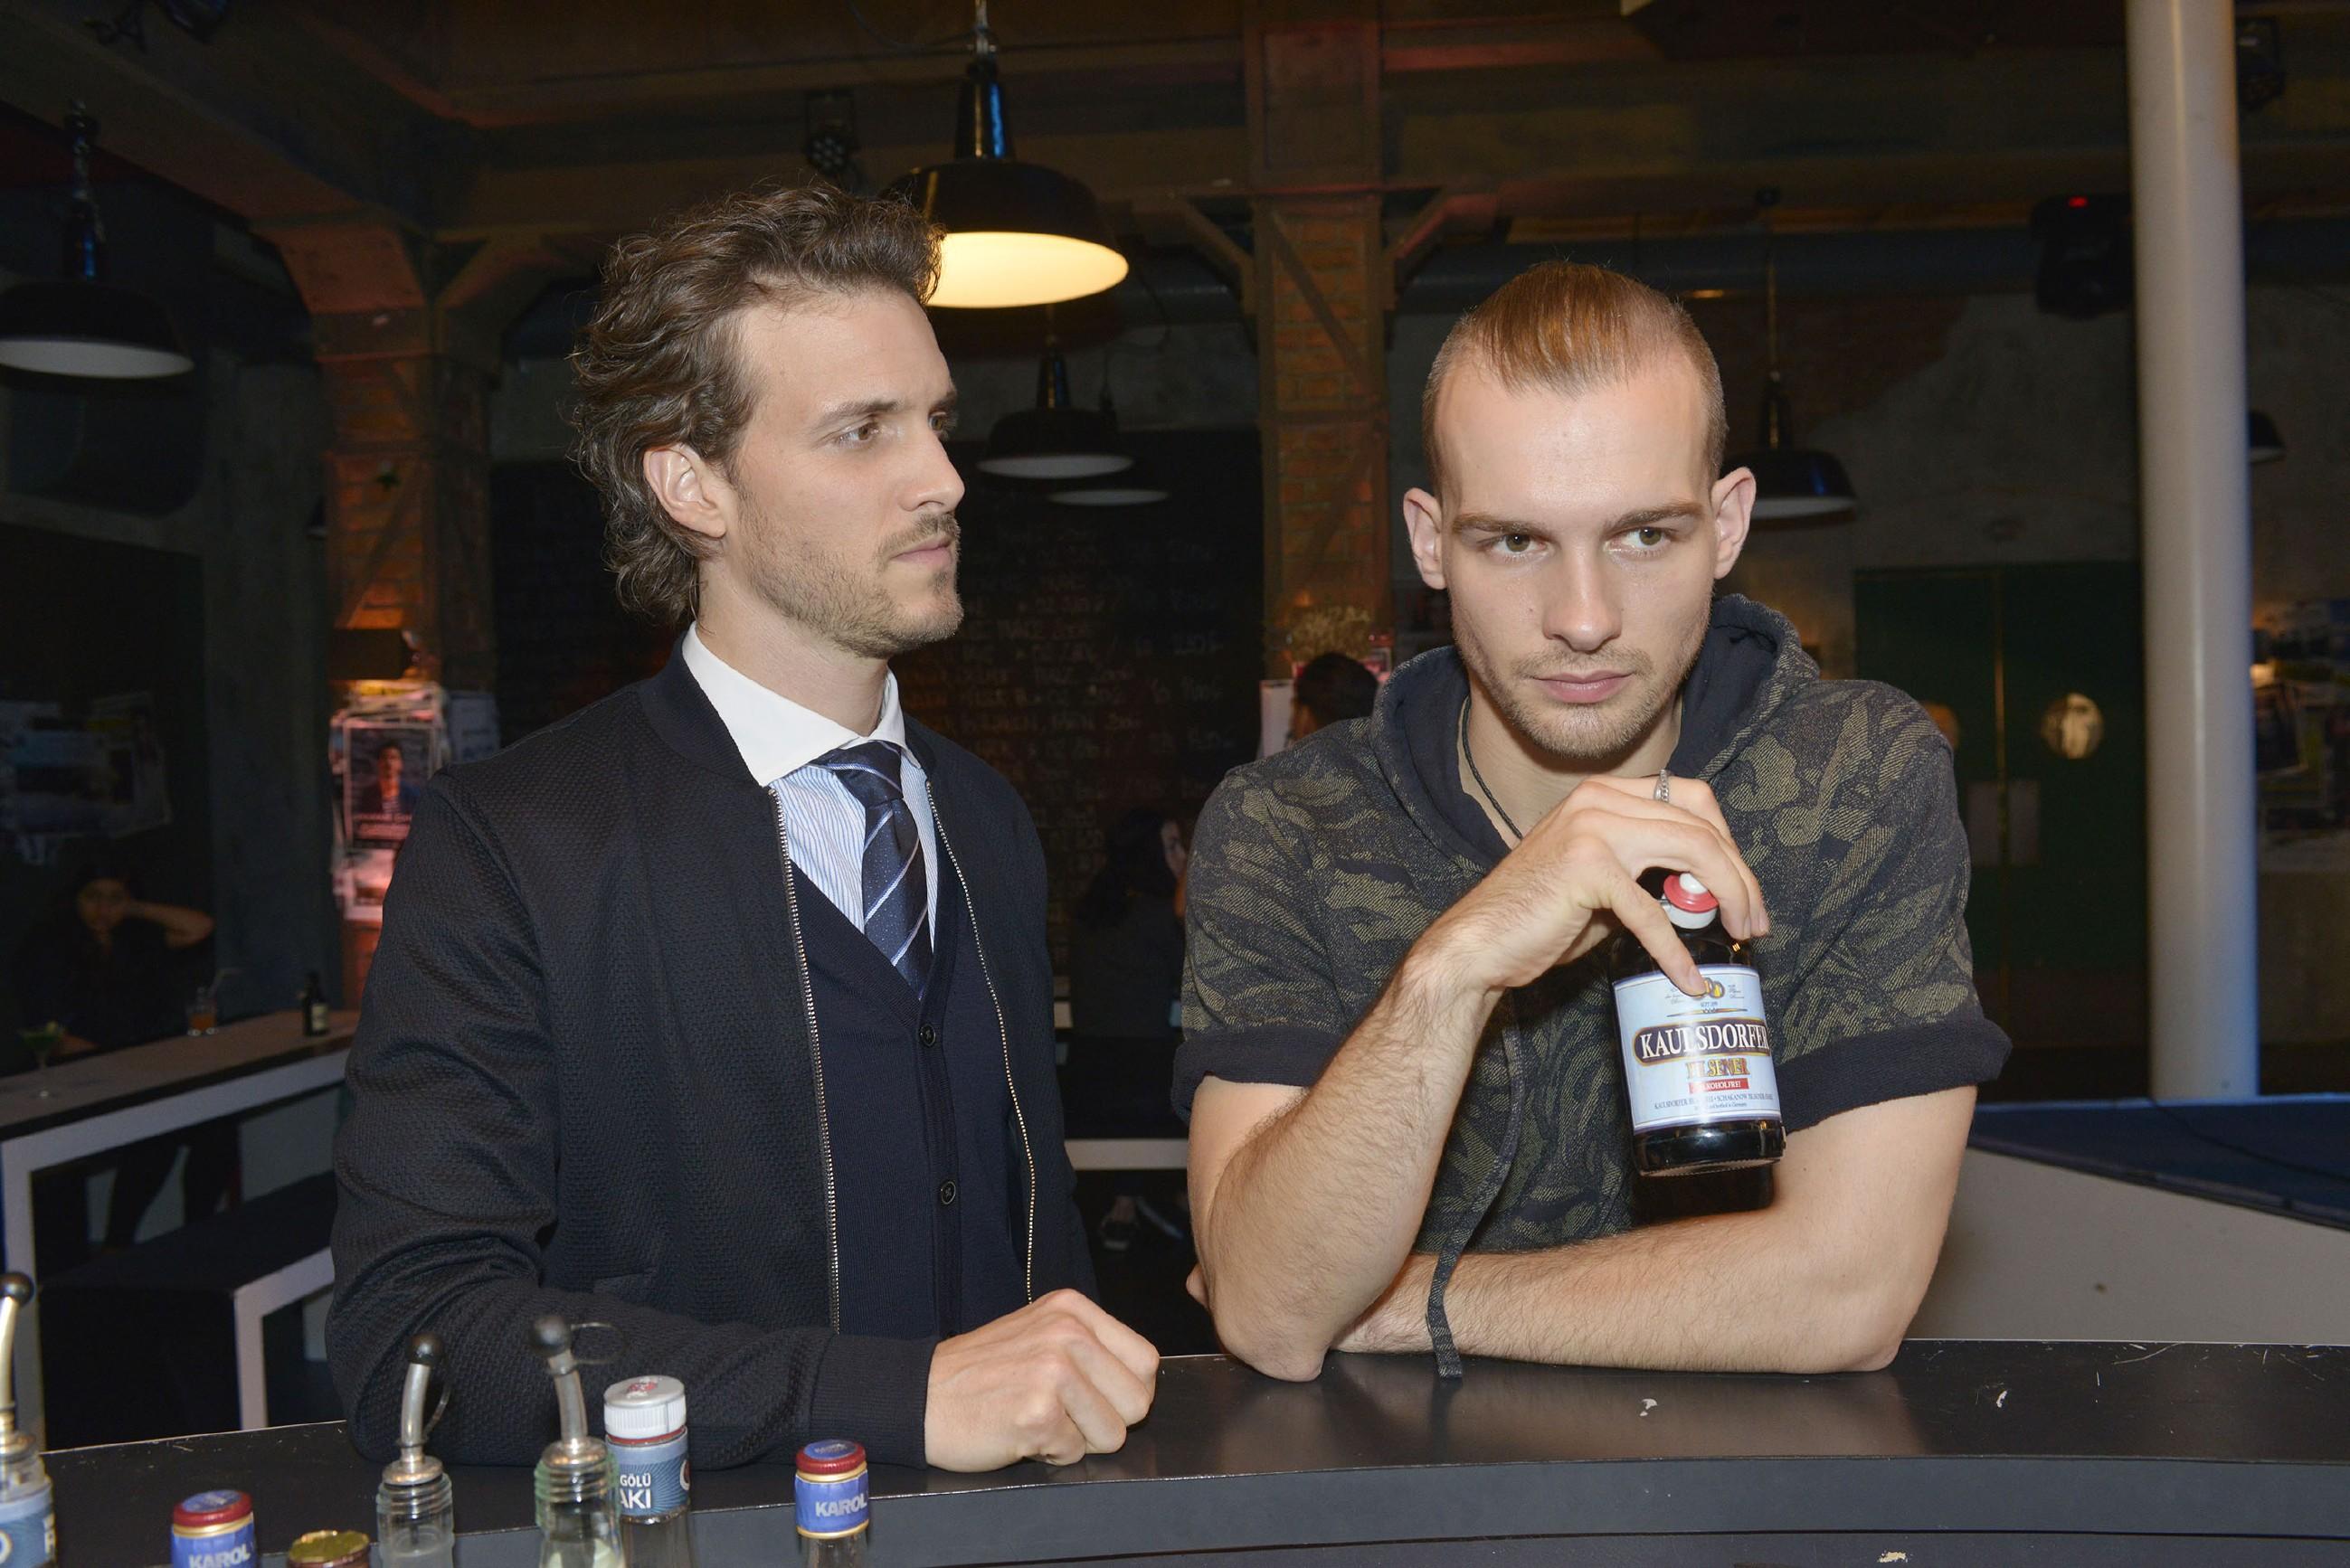 Chris (Eric Stehfest, r.) muss sich nach Felix' (Thaddäus Meilinger) Ansage fragen, ob er Rosa zu Unrecht Vorwürfe gemacht hat. (Quelle: RTL / Rolf Baumgartner)